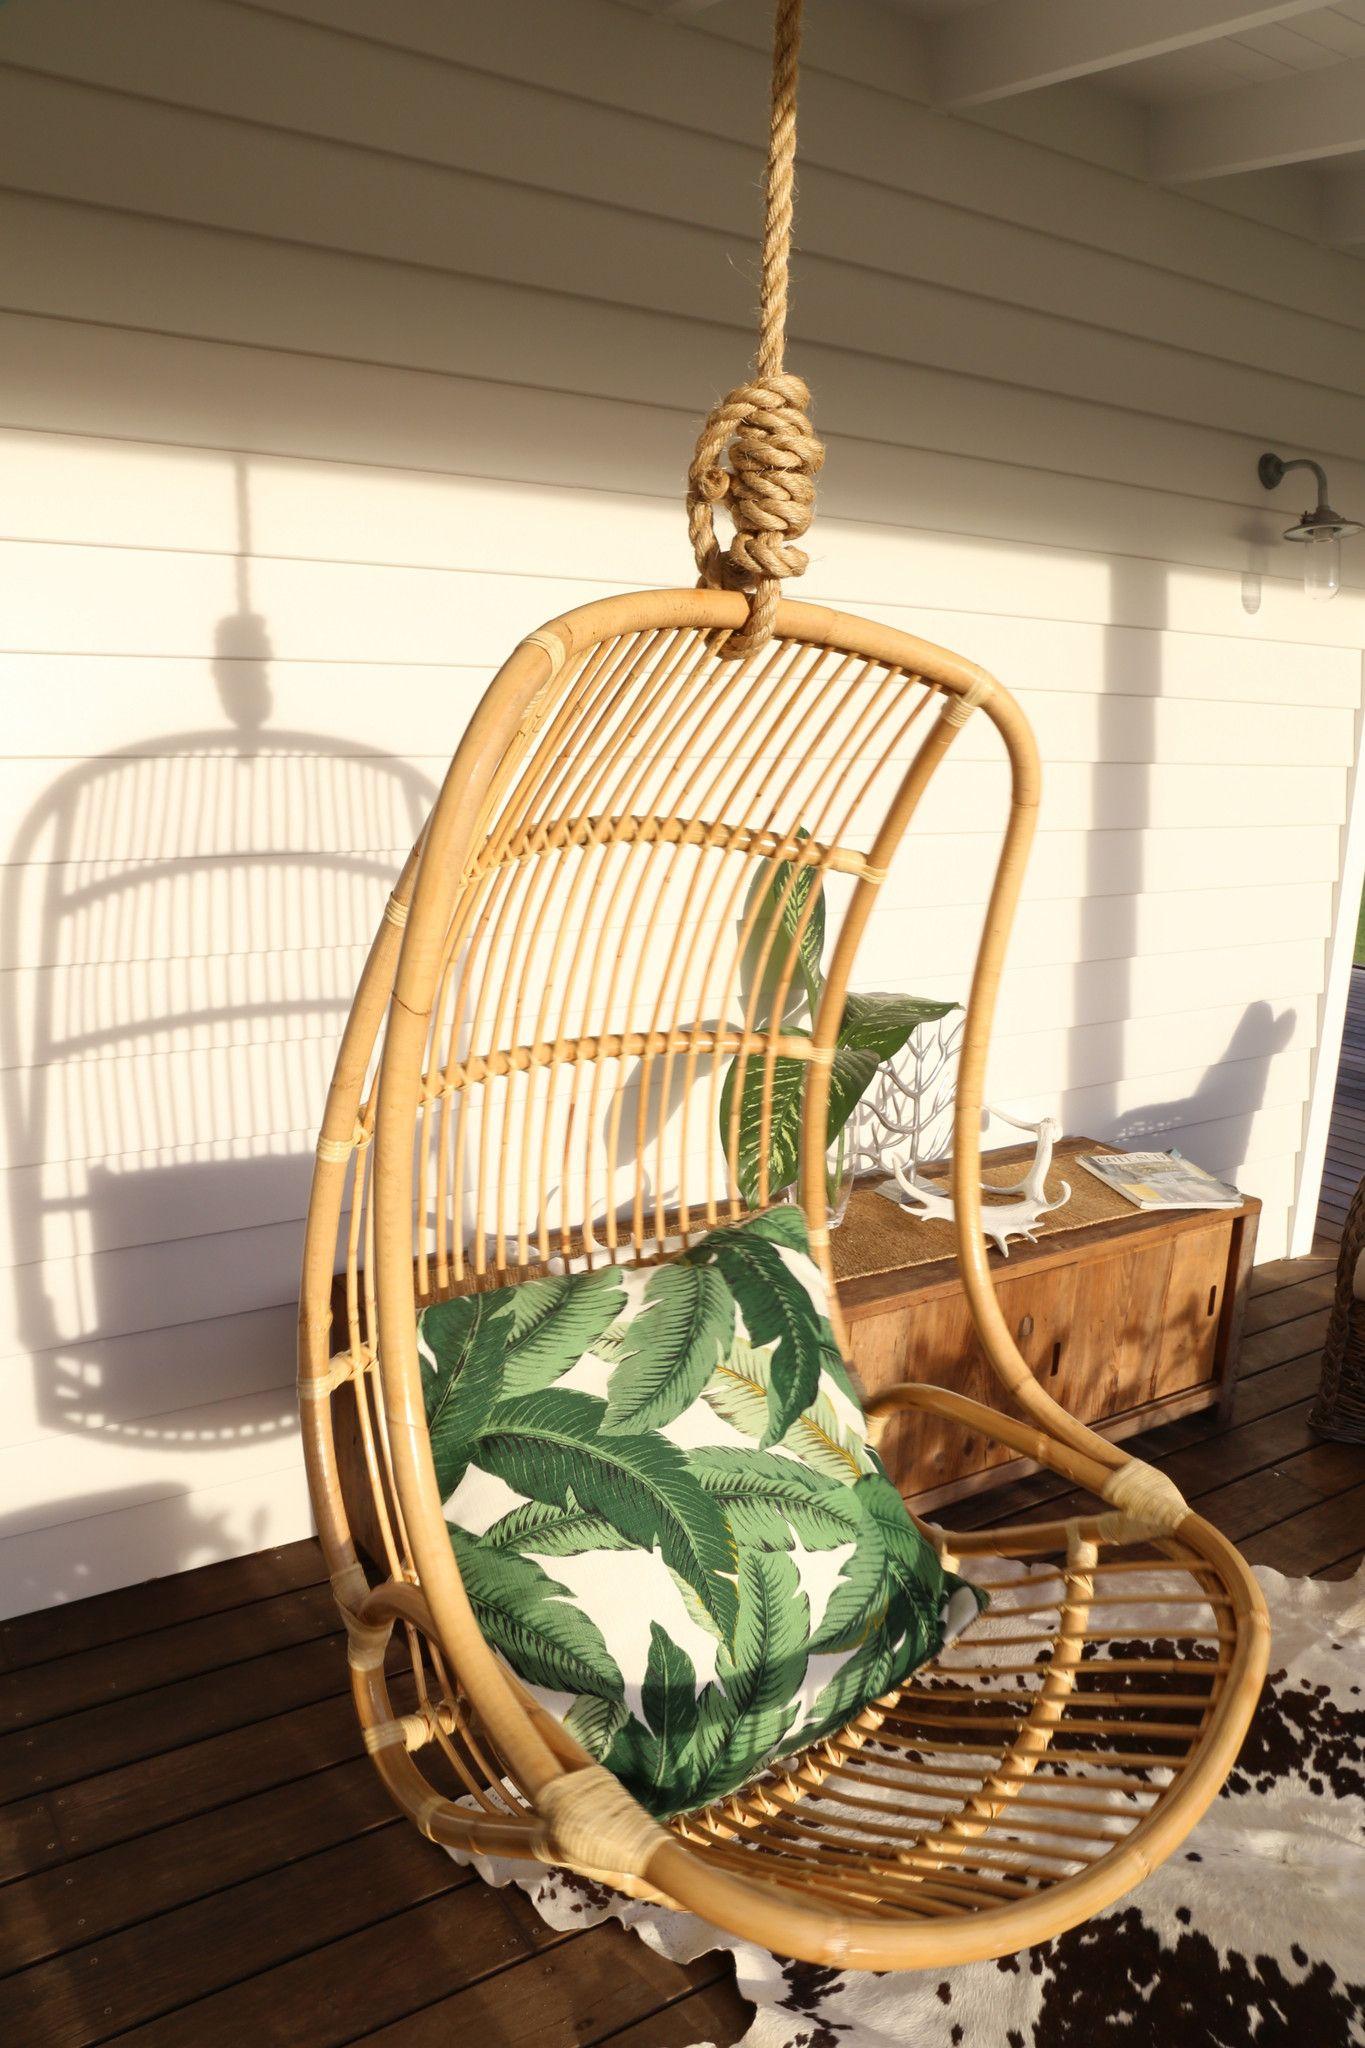 70s swing chair single hanging chair swinging chair chair